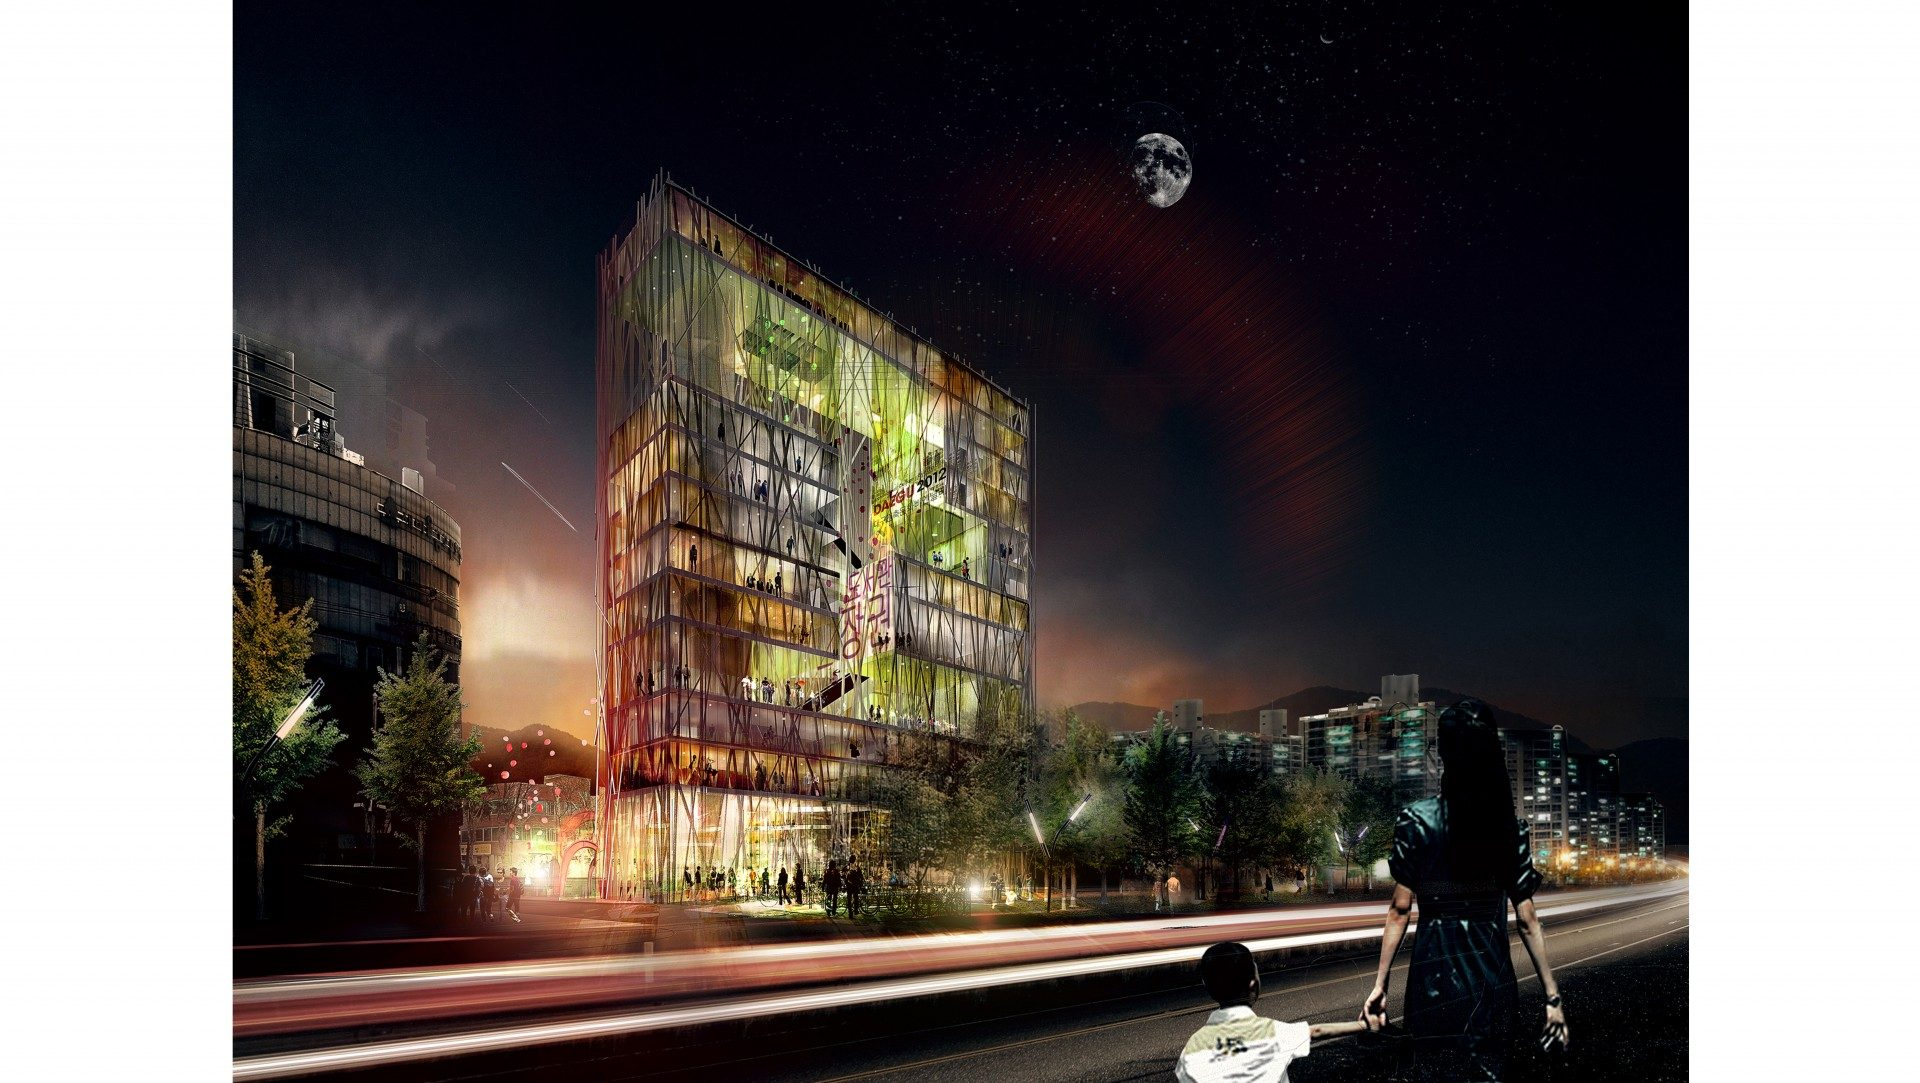 Daegu Central Library Night